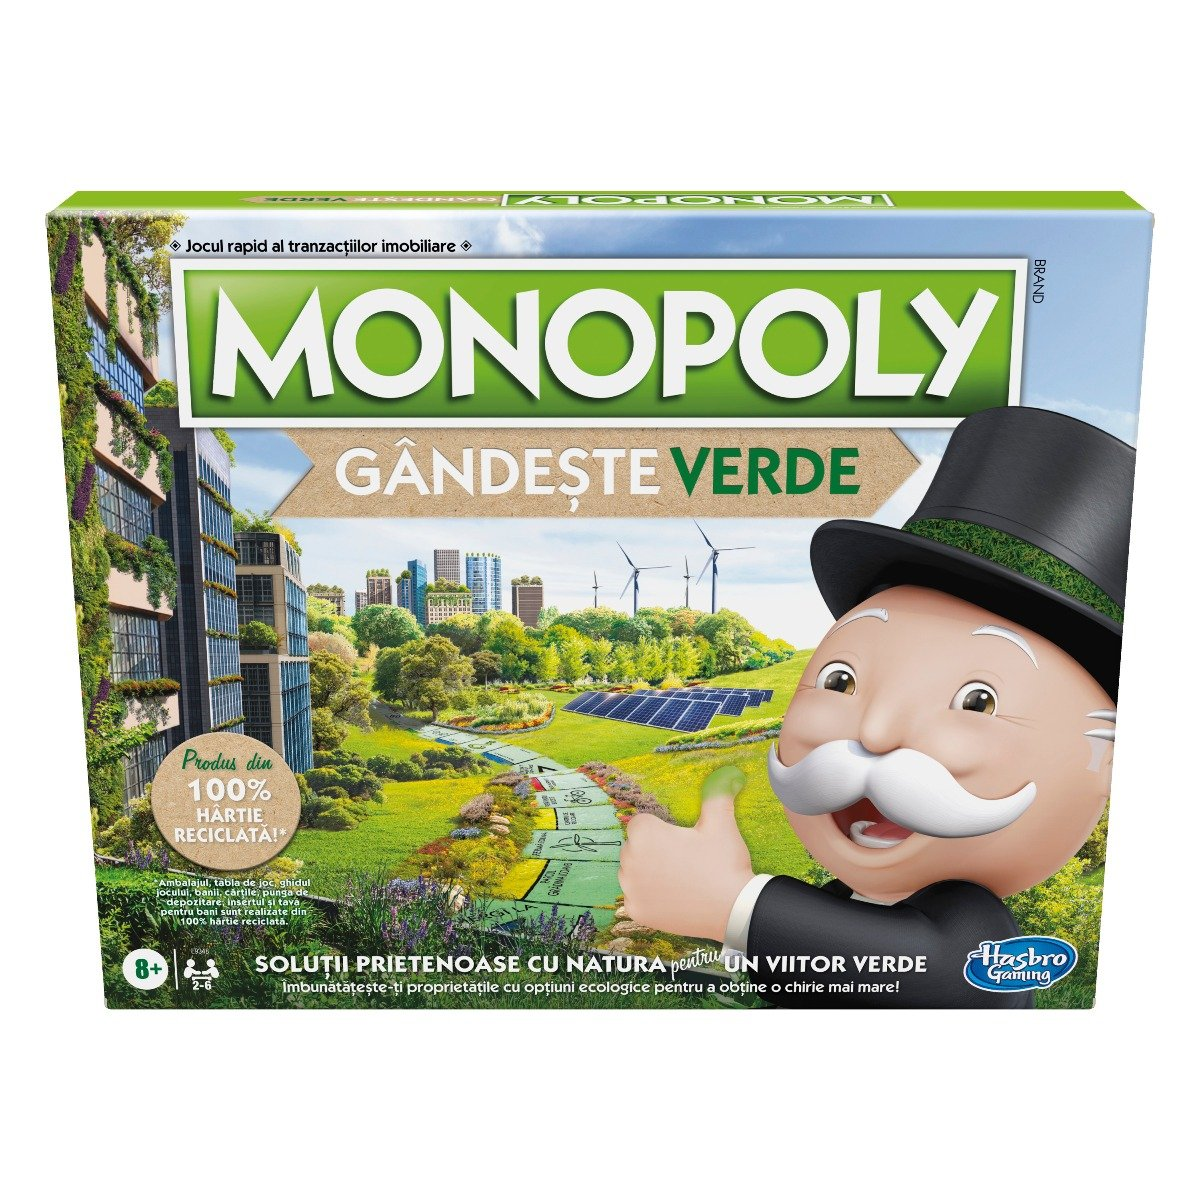 Joc Monopoly, Gandeste verde